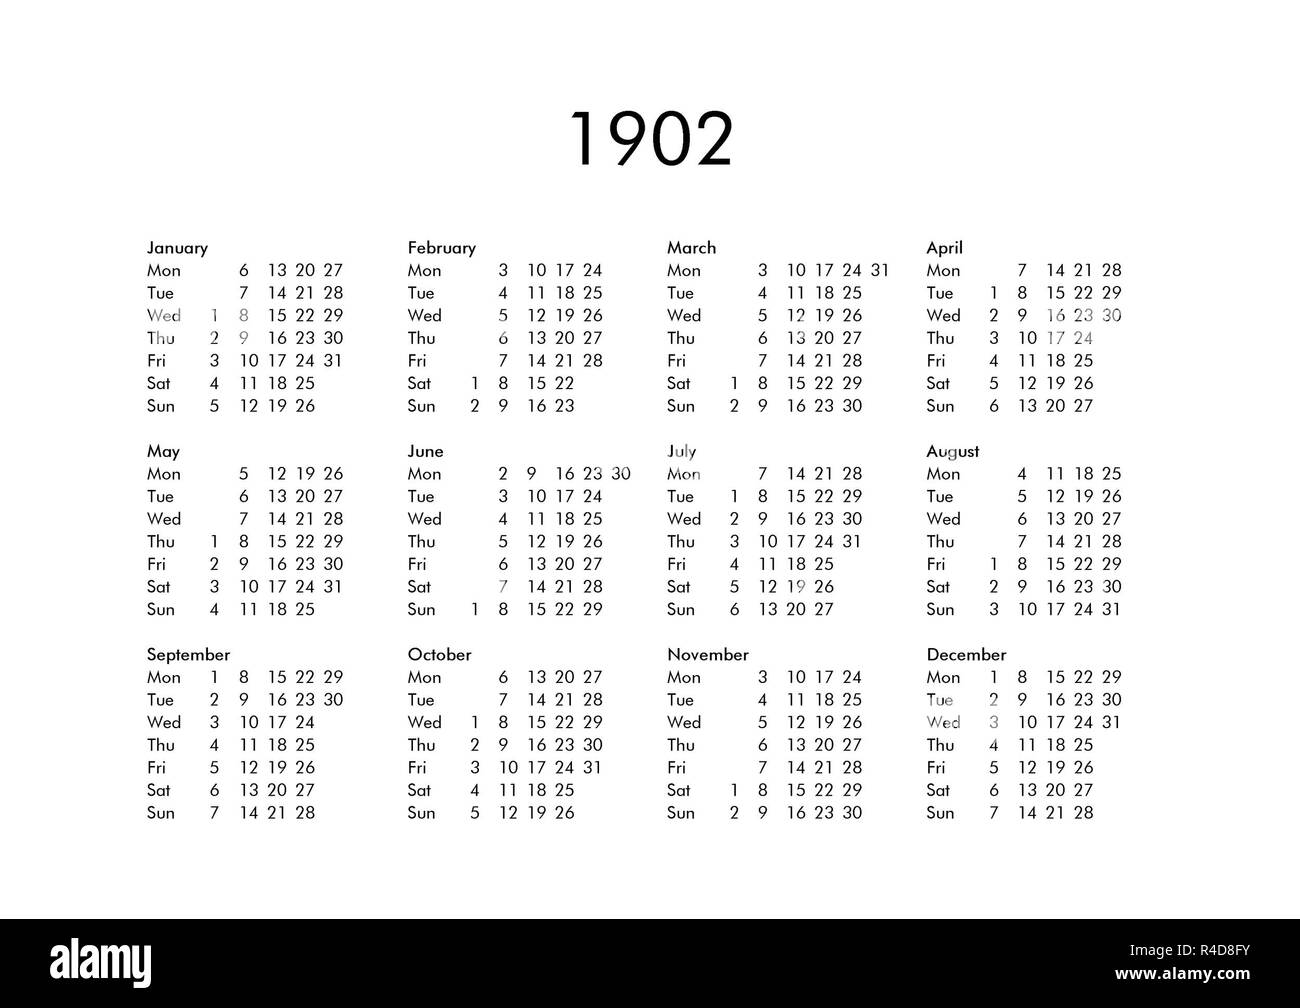 Calendar of year 1902 Stock Photo - Alamy